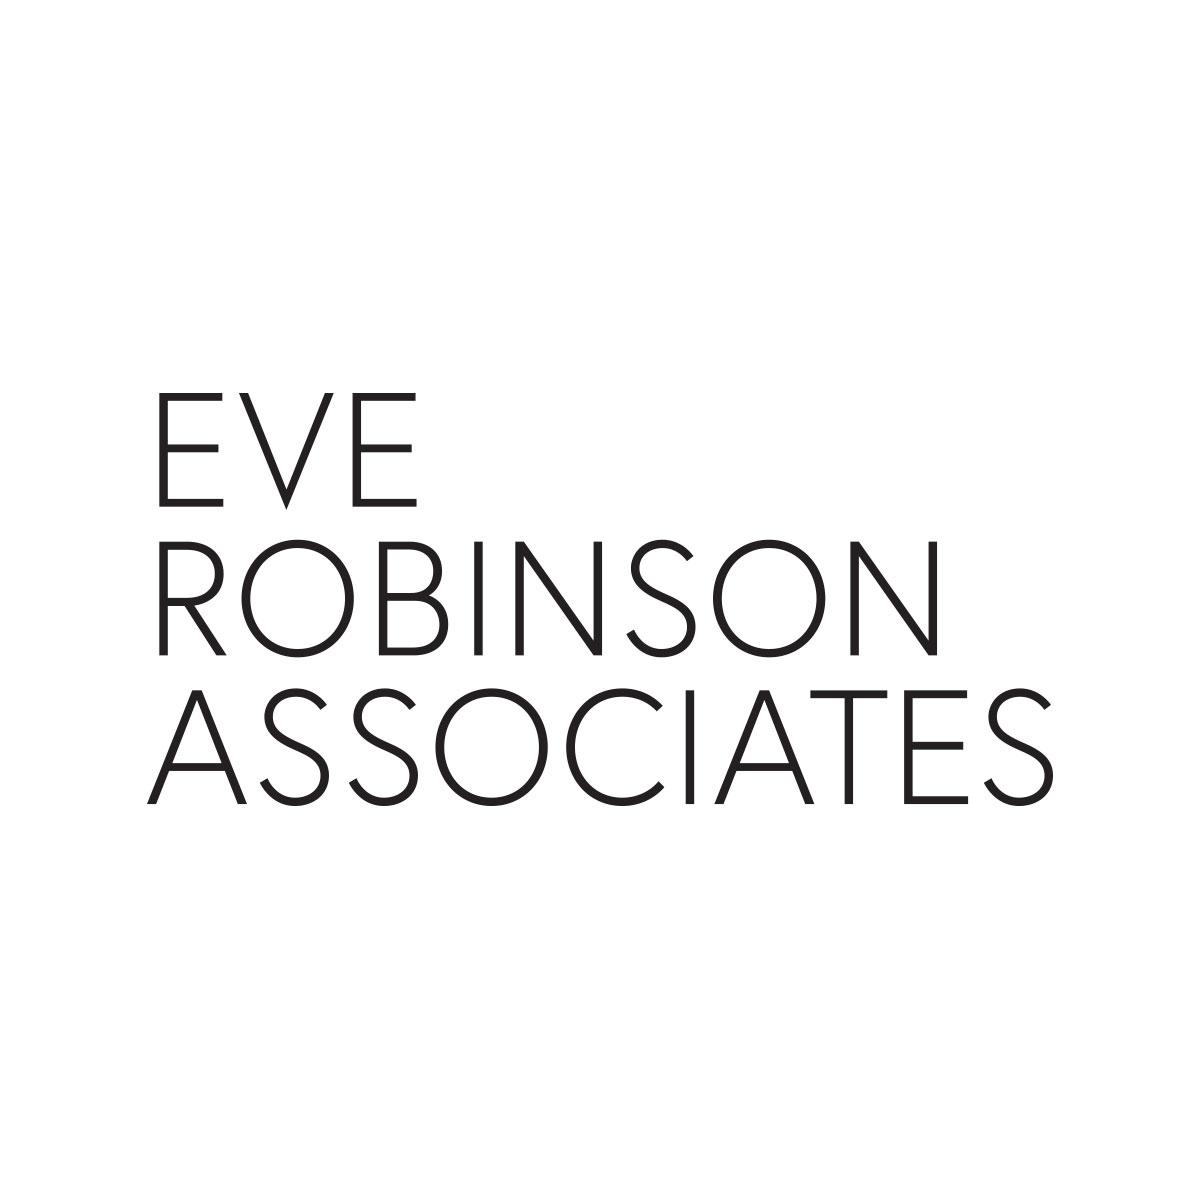 Eve Robinson Associates Logo